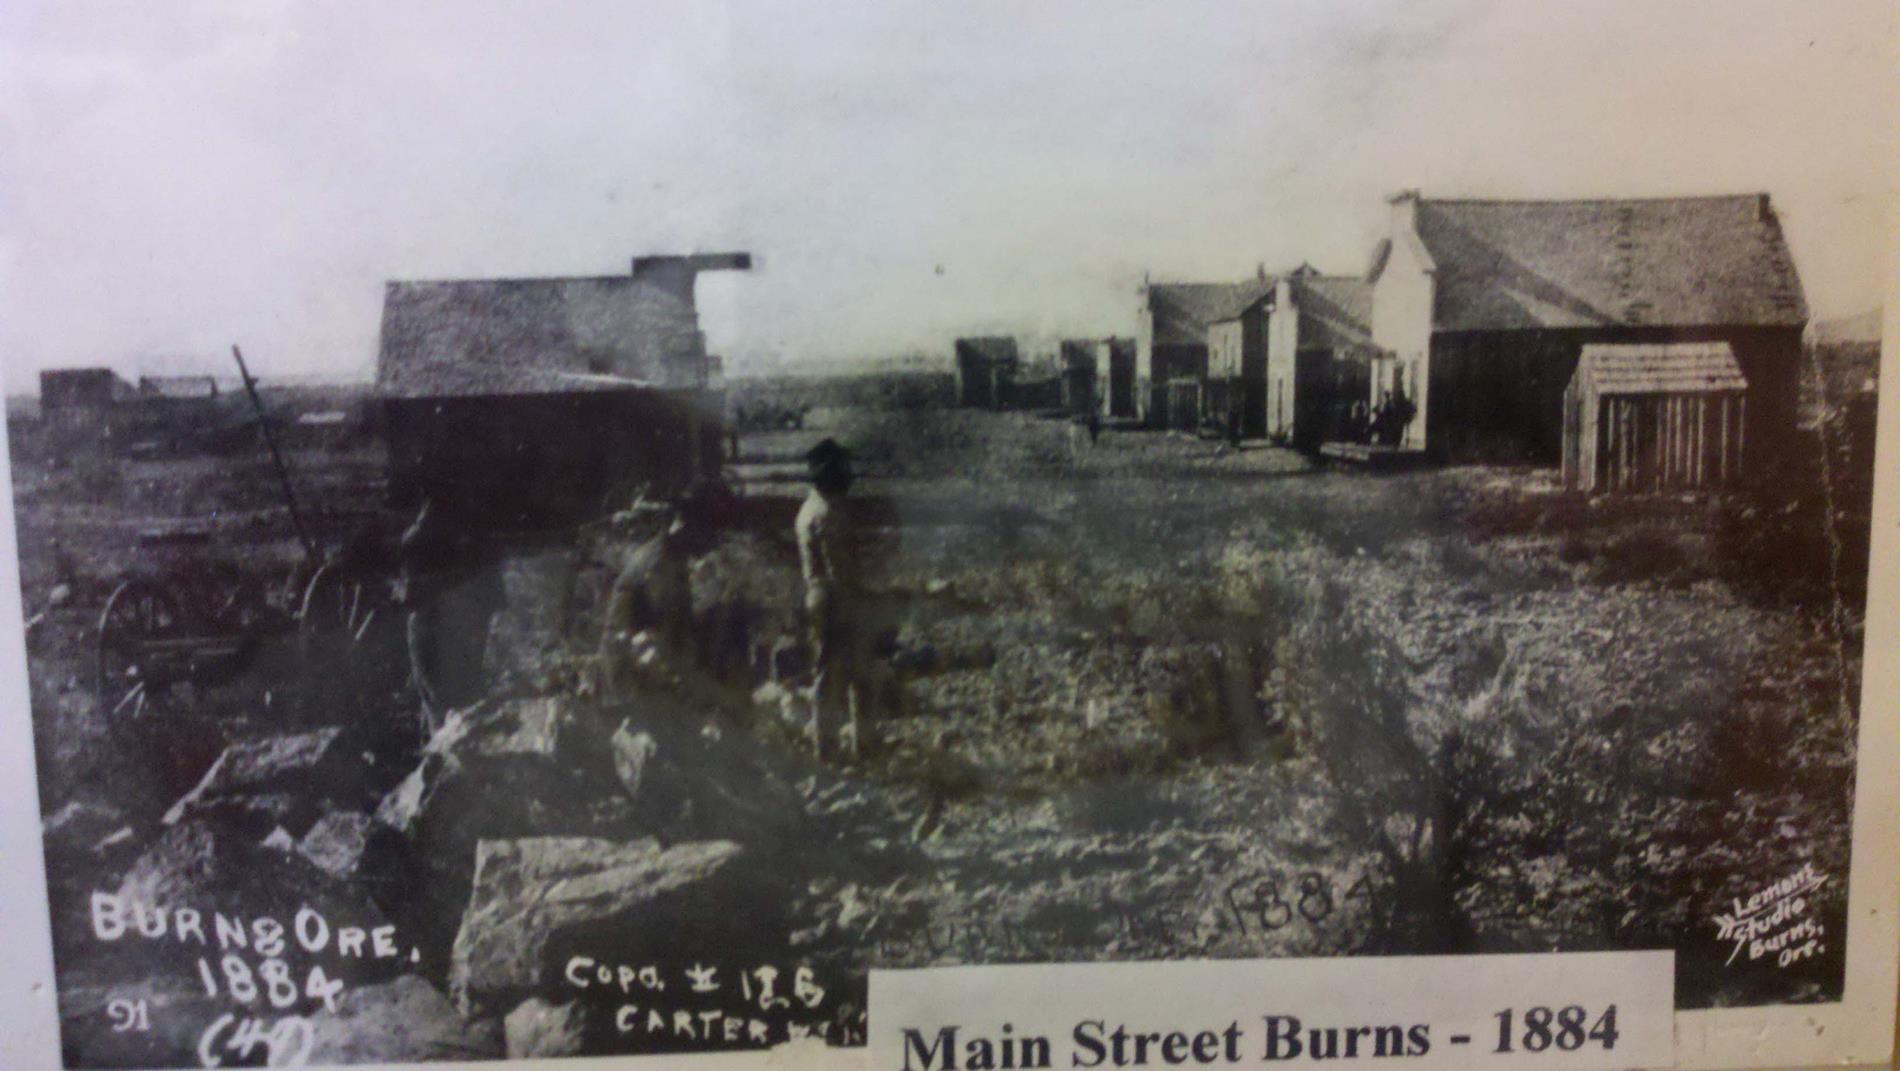 Main Street Burns 1884